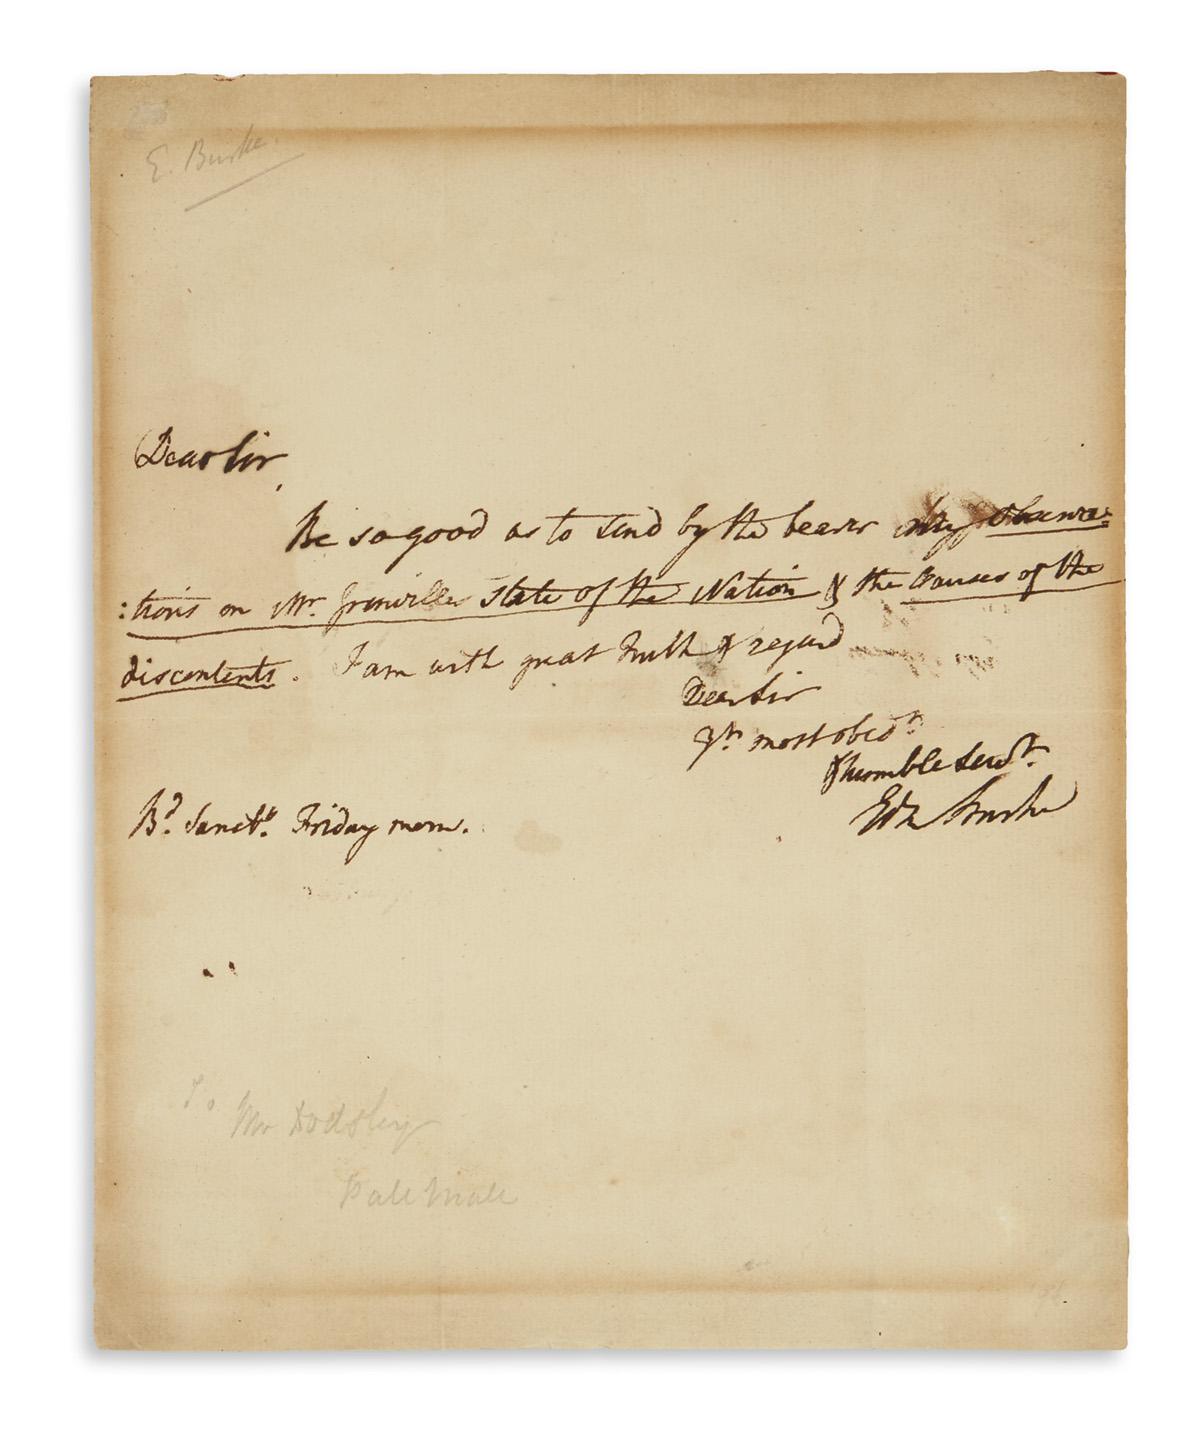 BURKE-EDMUND-Brief-Autograph-Letter-Signed-EdmBurke-to-books